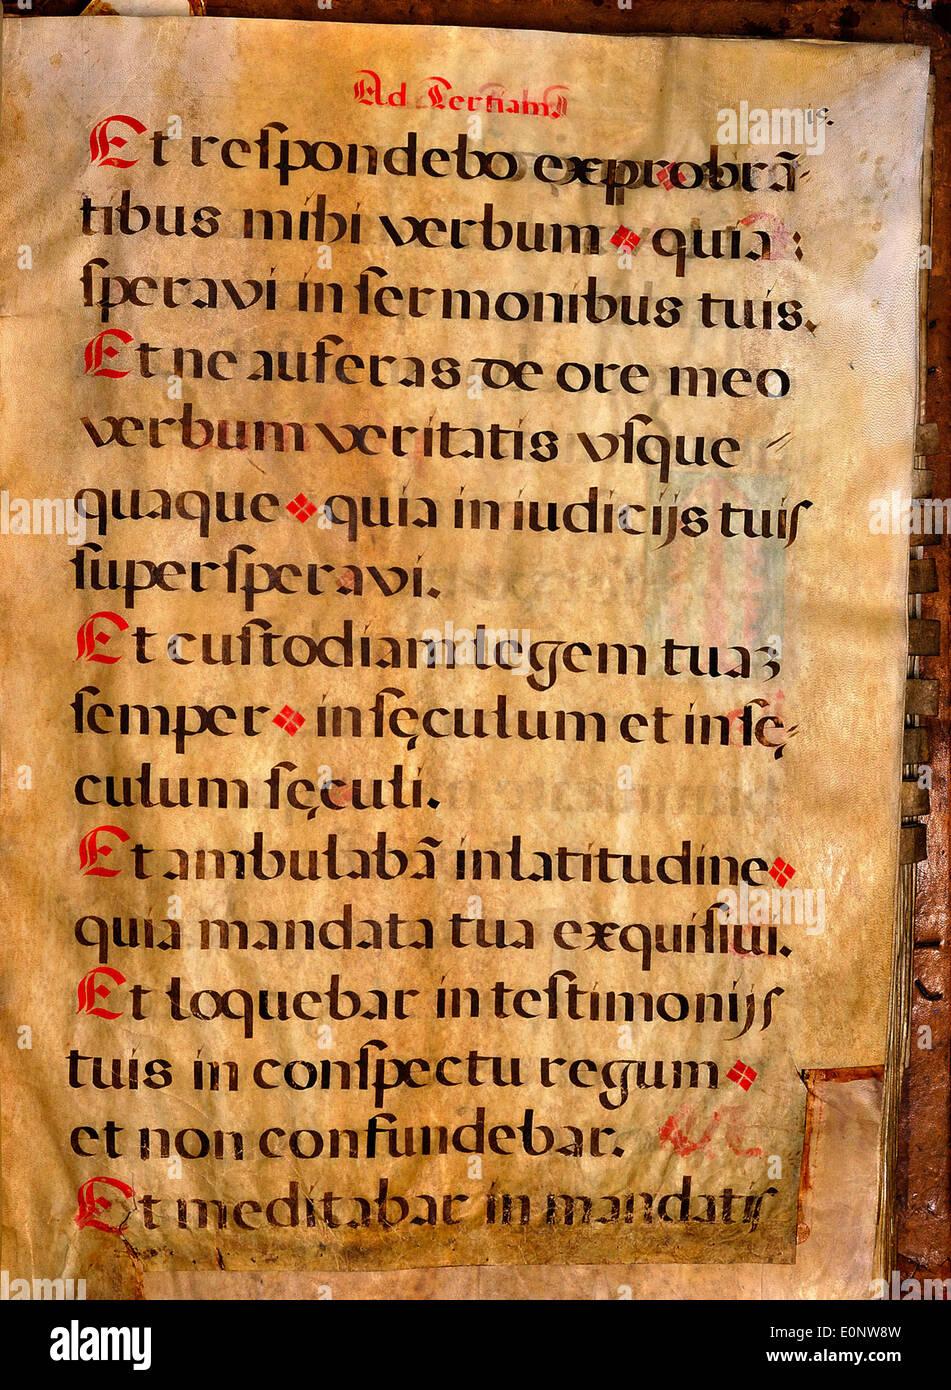 Spanish Chant Manuscript page 036 Stock Photo: 69322313 - Alamy